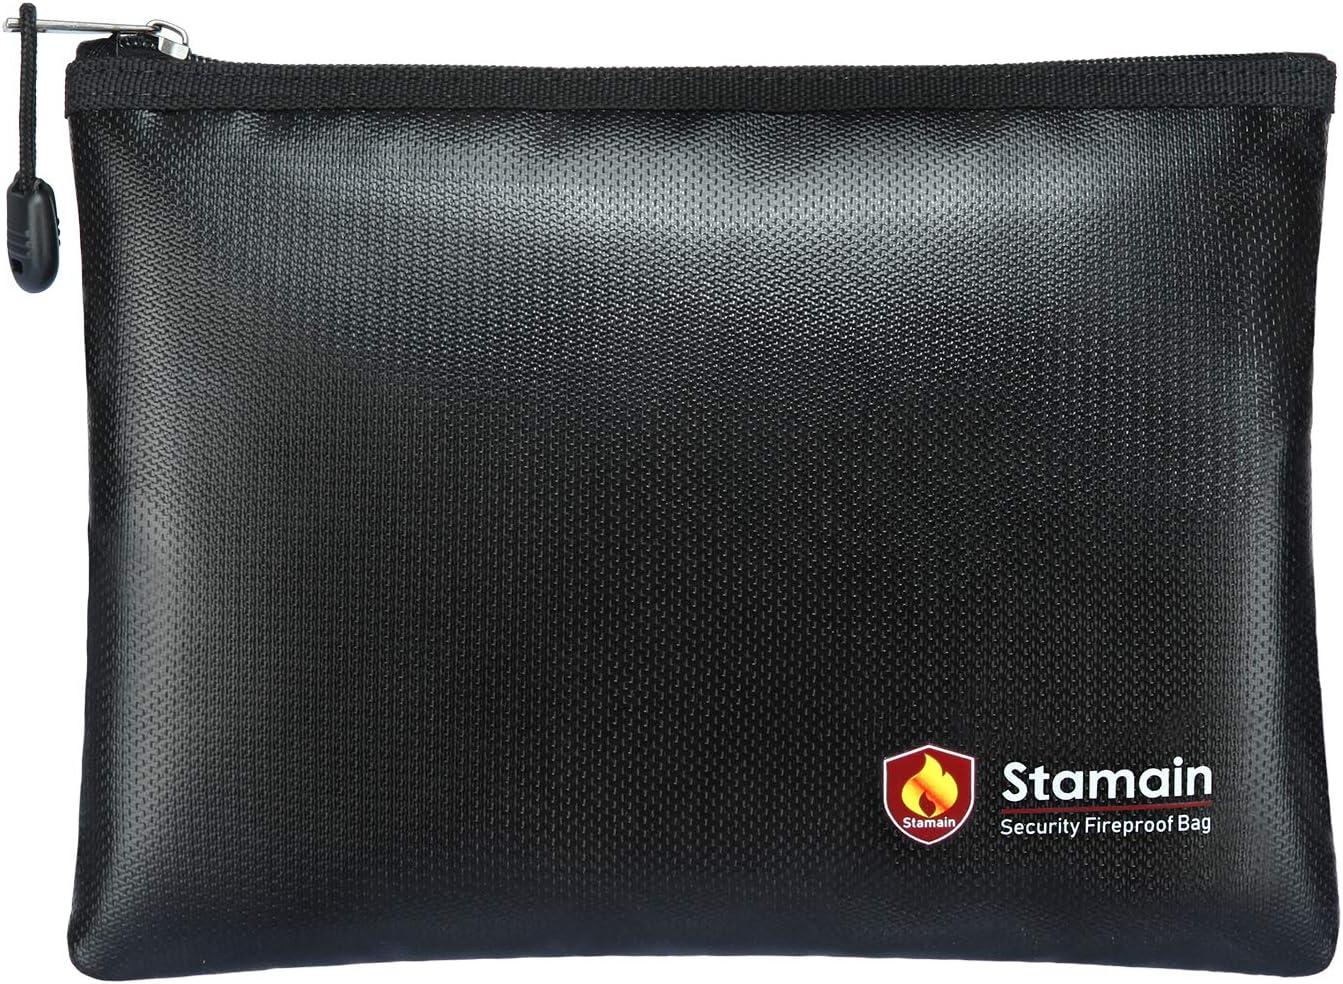 "Fireproof Safe Fireproof Document Bag Money Bag, Stamain Large Fireproof Bag(13.4""x 9.8"") with Zipper, Fire and Water Resistant Fire Safe Bag Home Safe for Money, Document, File, Valuables(Black)"